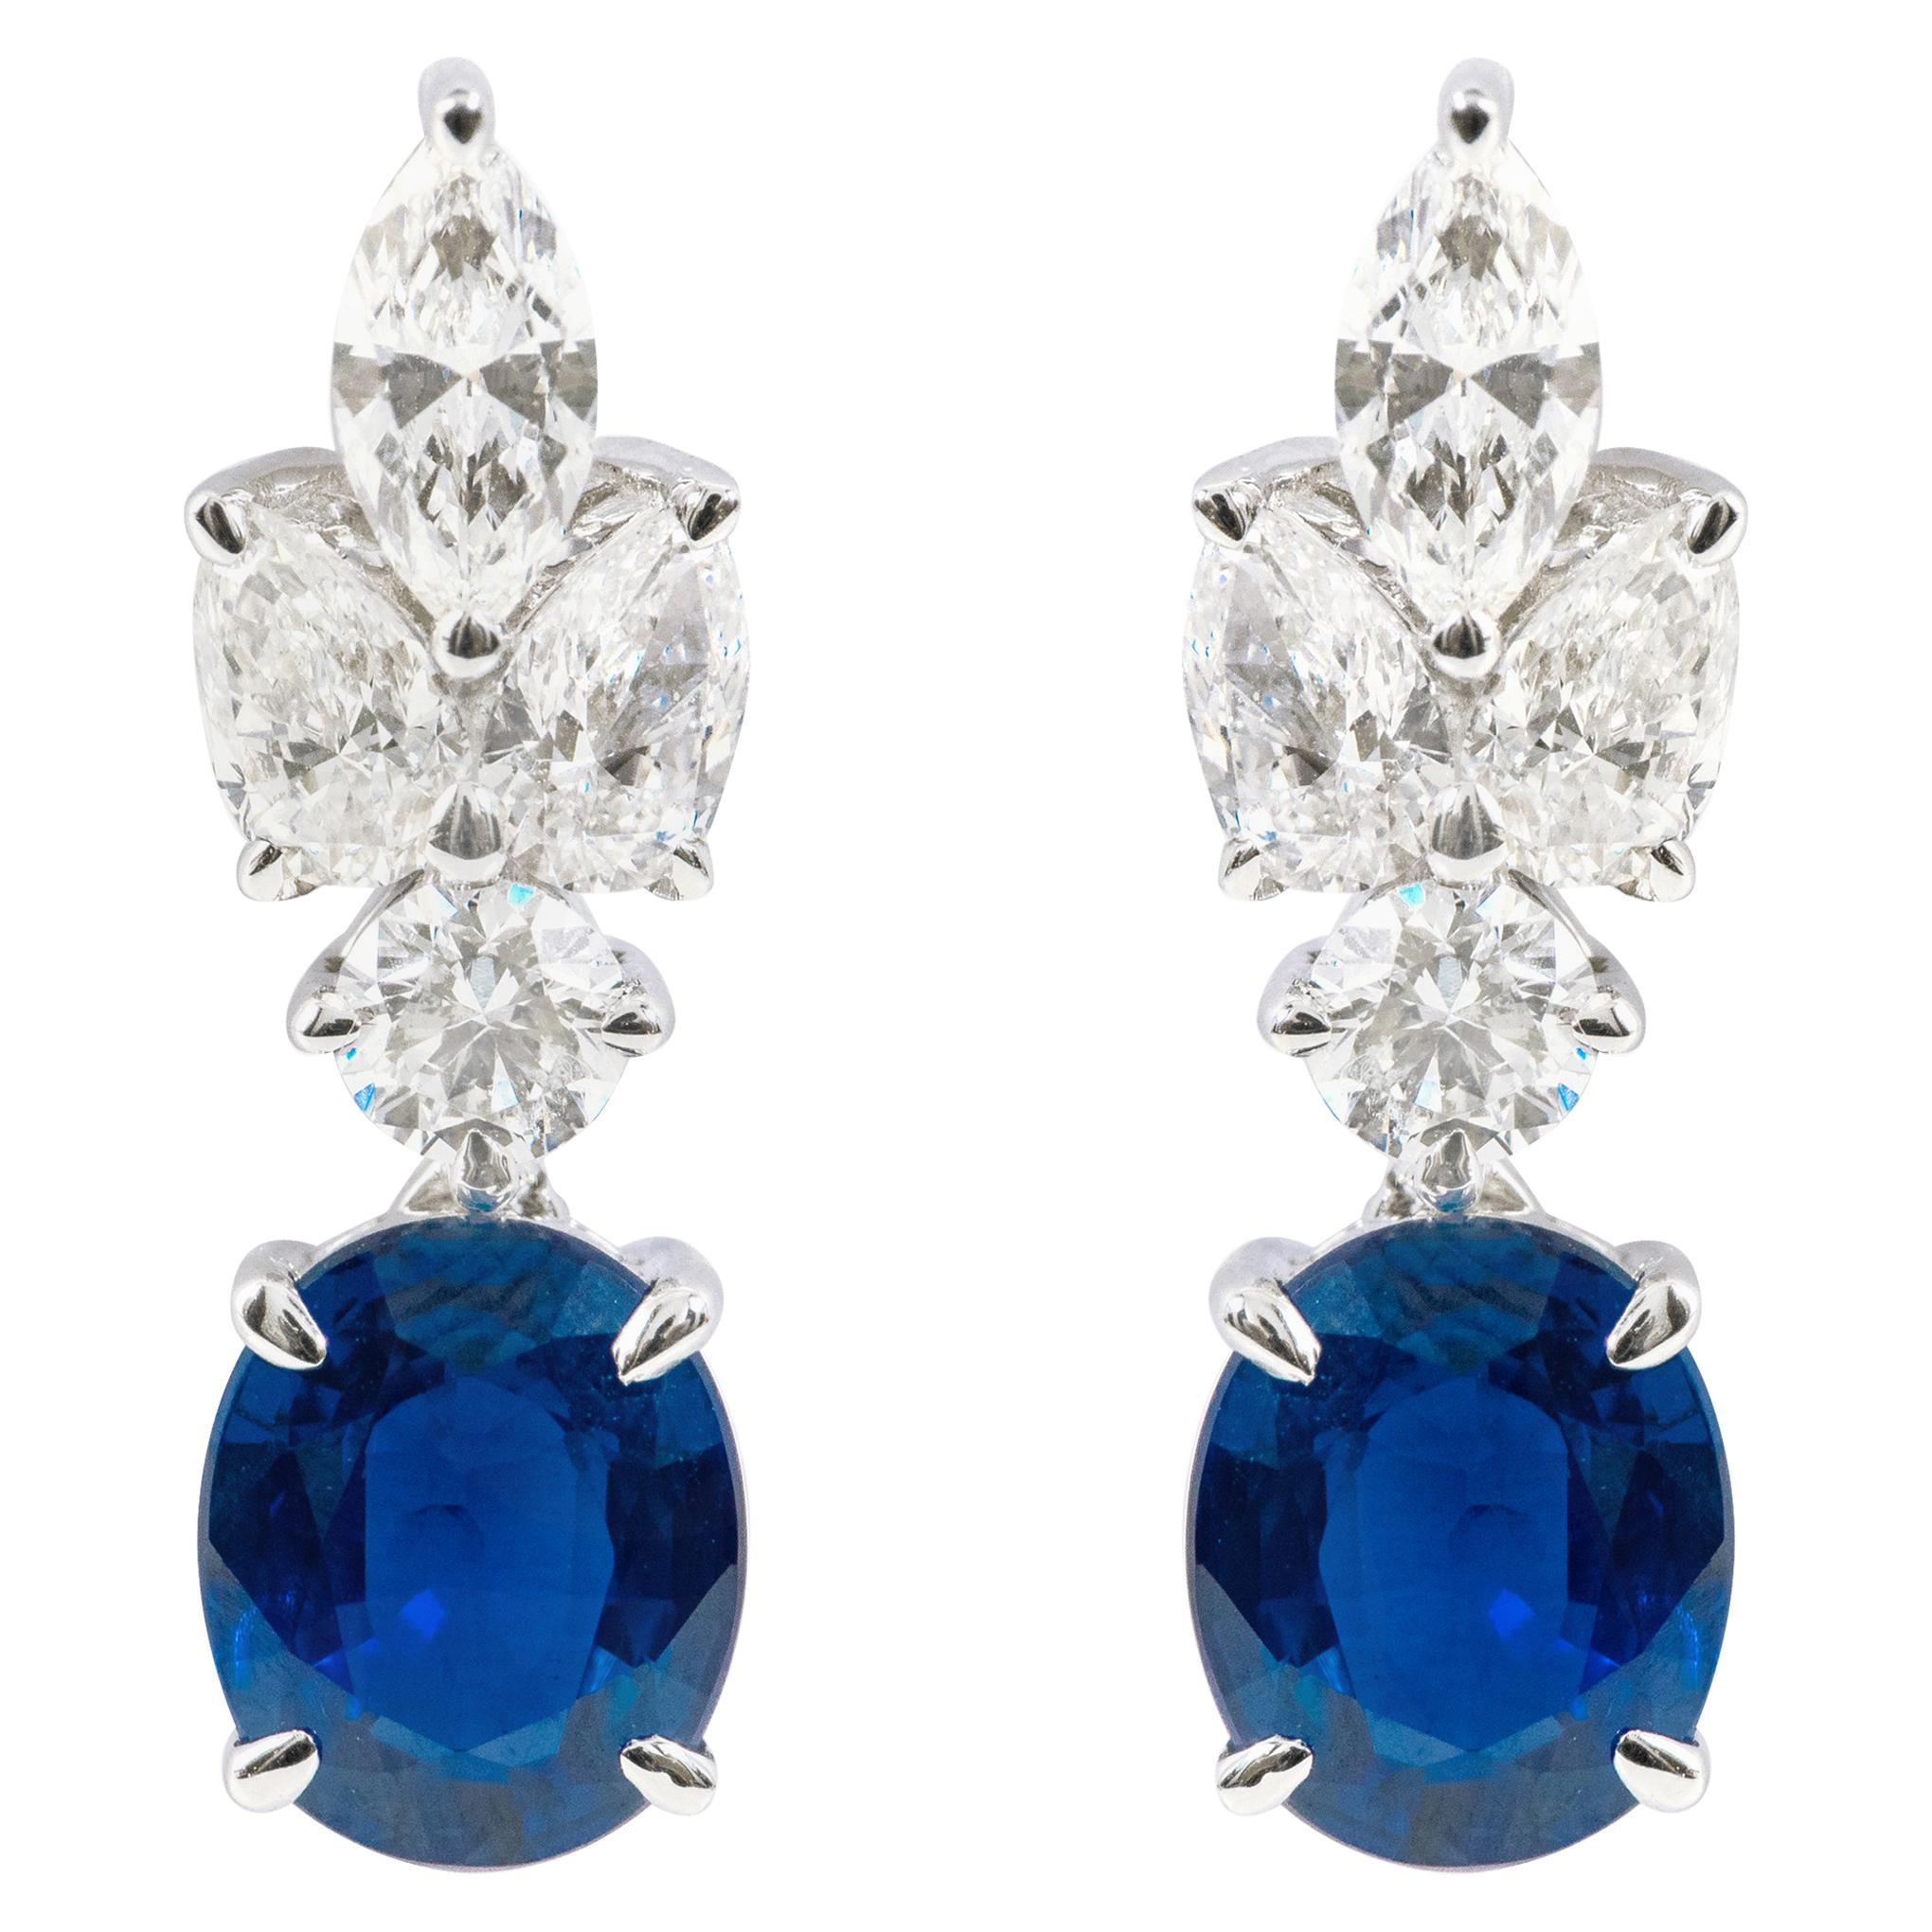 18 Karat White Gold 4.05 Carat Sapphire and Diamond Drop Earrings